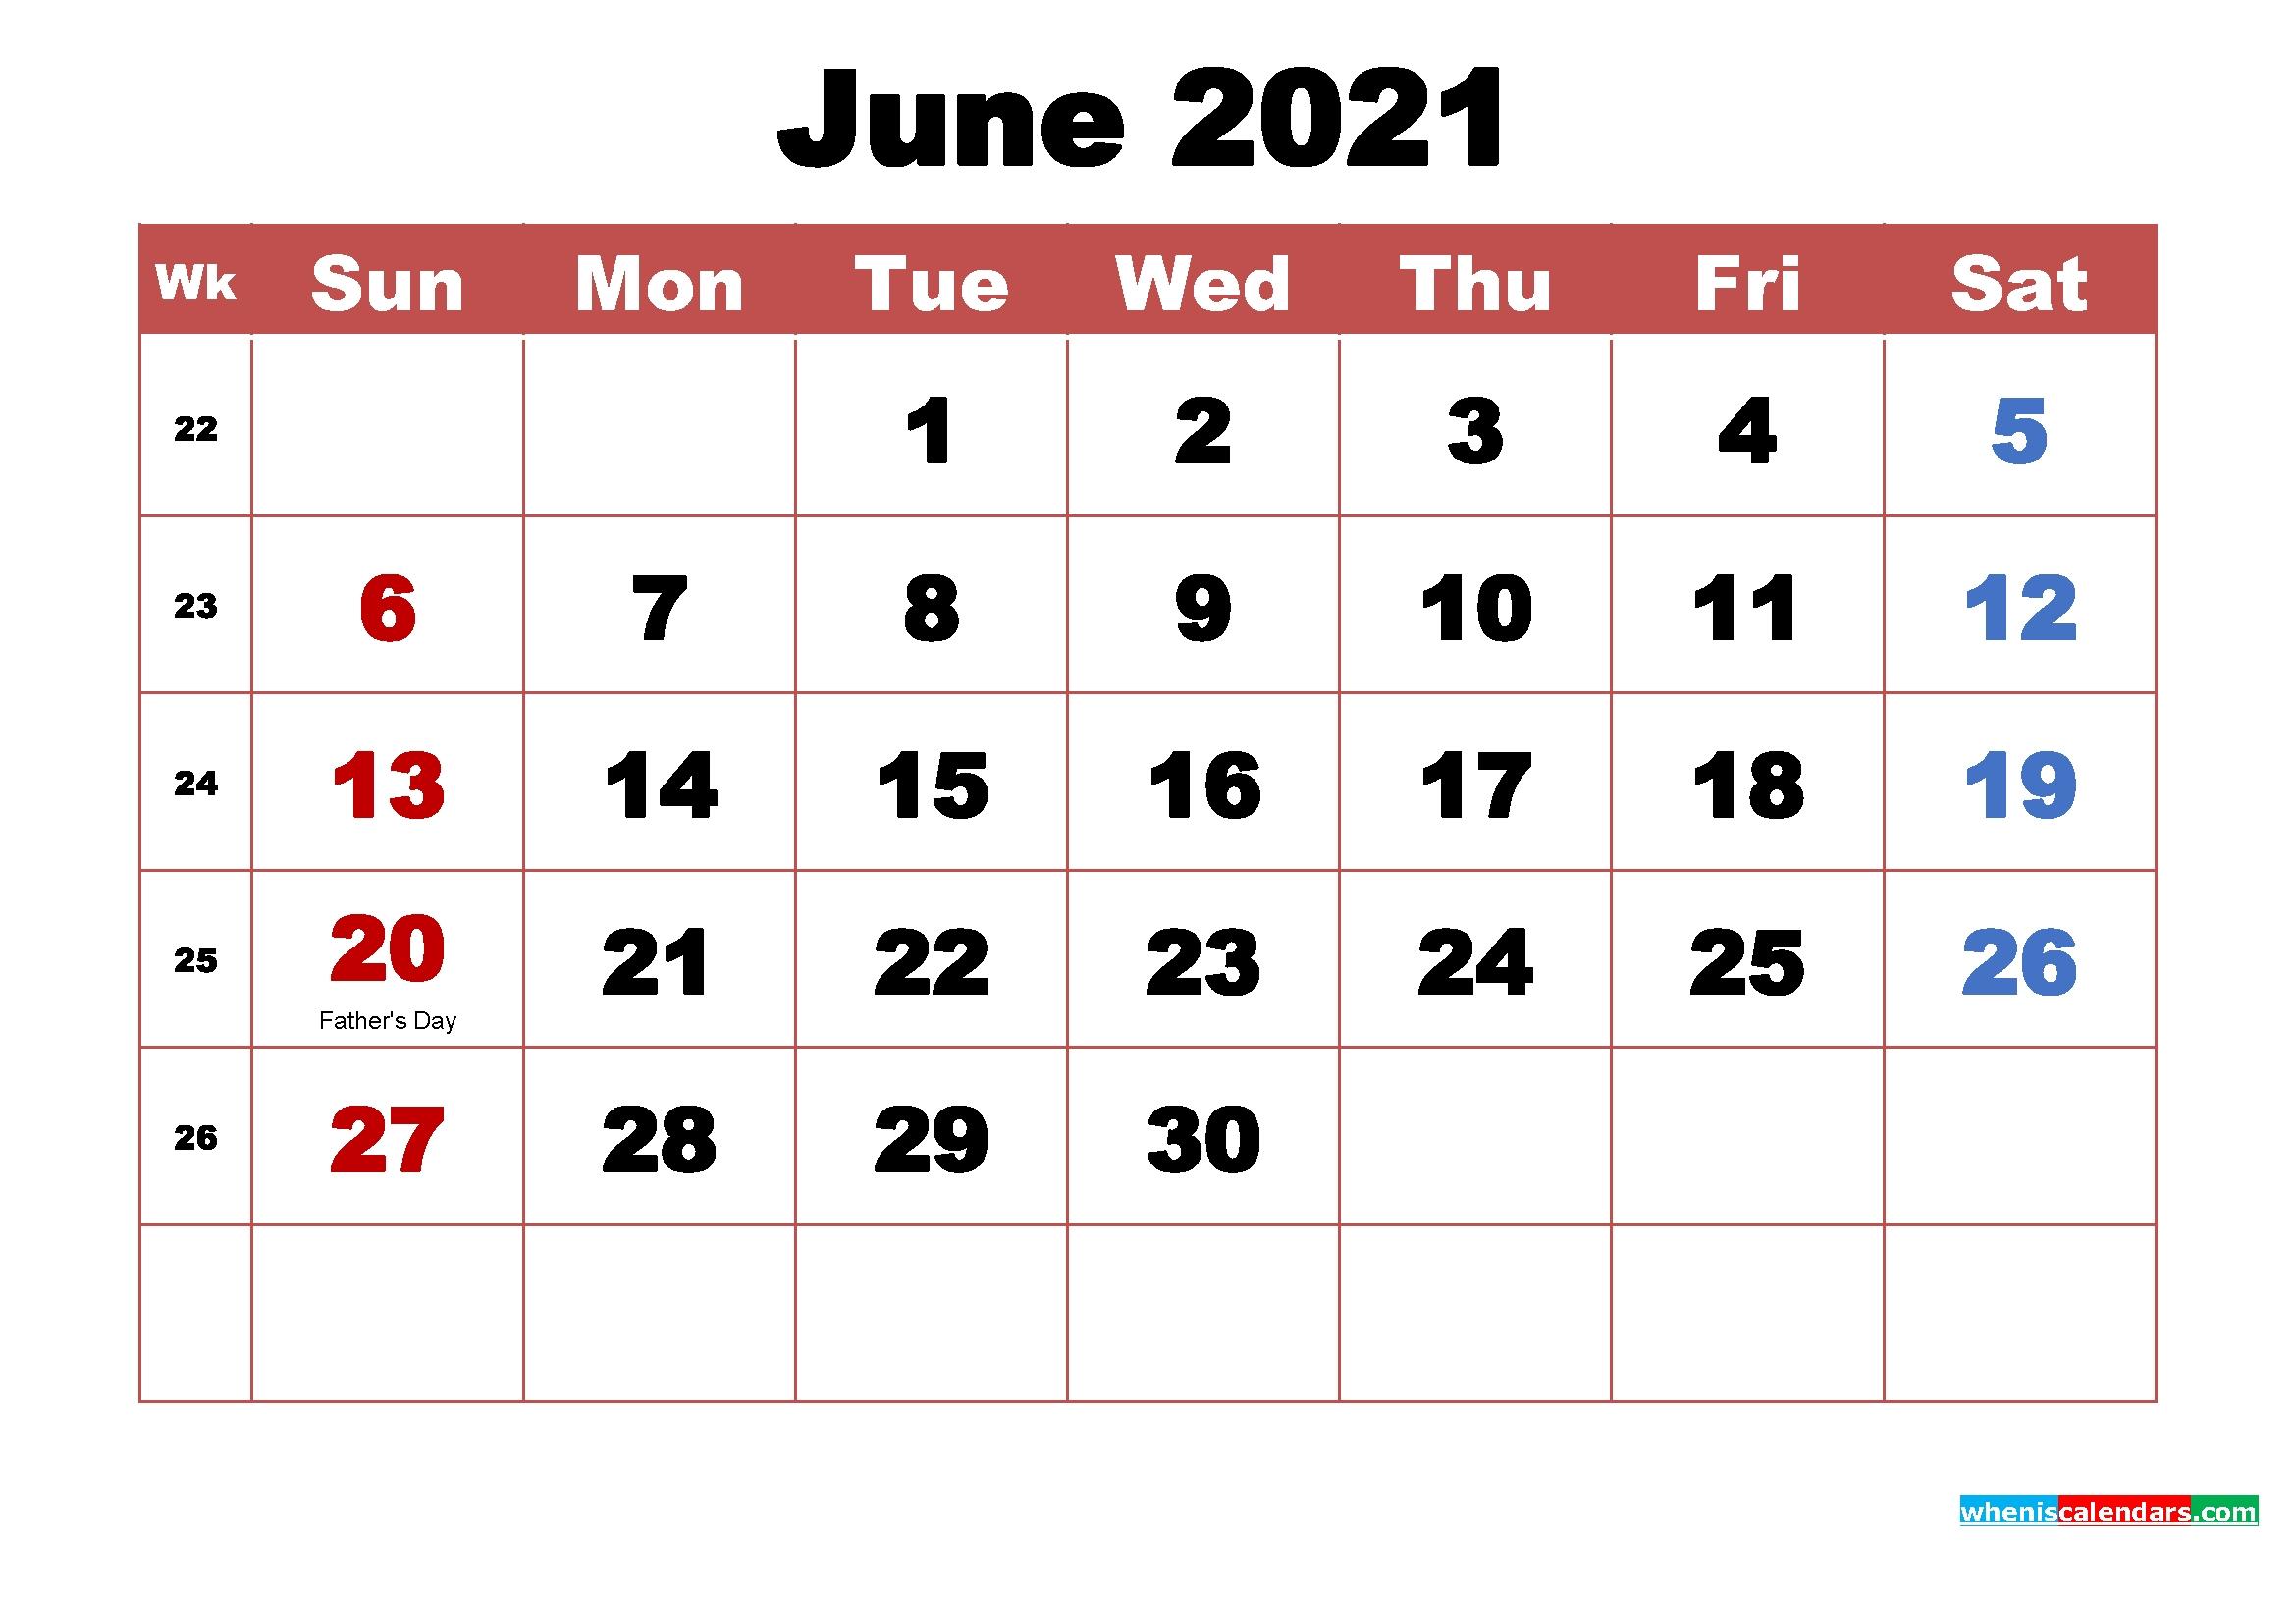 Calendar June 2021 With Holidays - United States Map Editable June 2021 Calendar